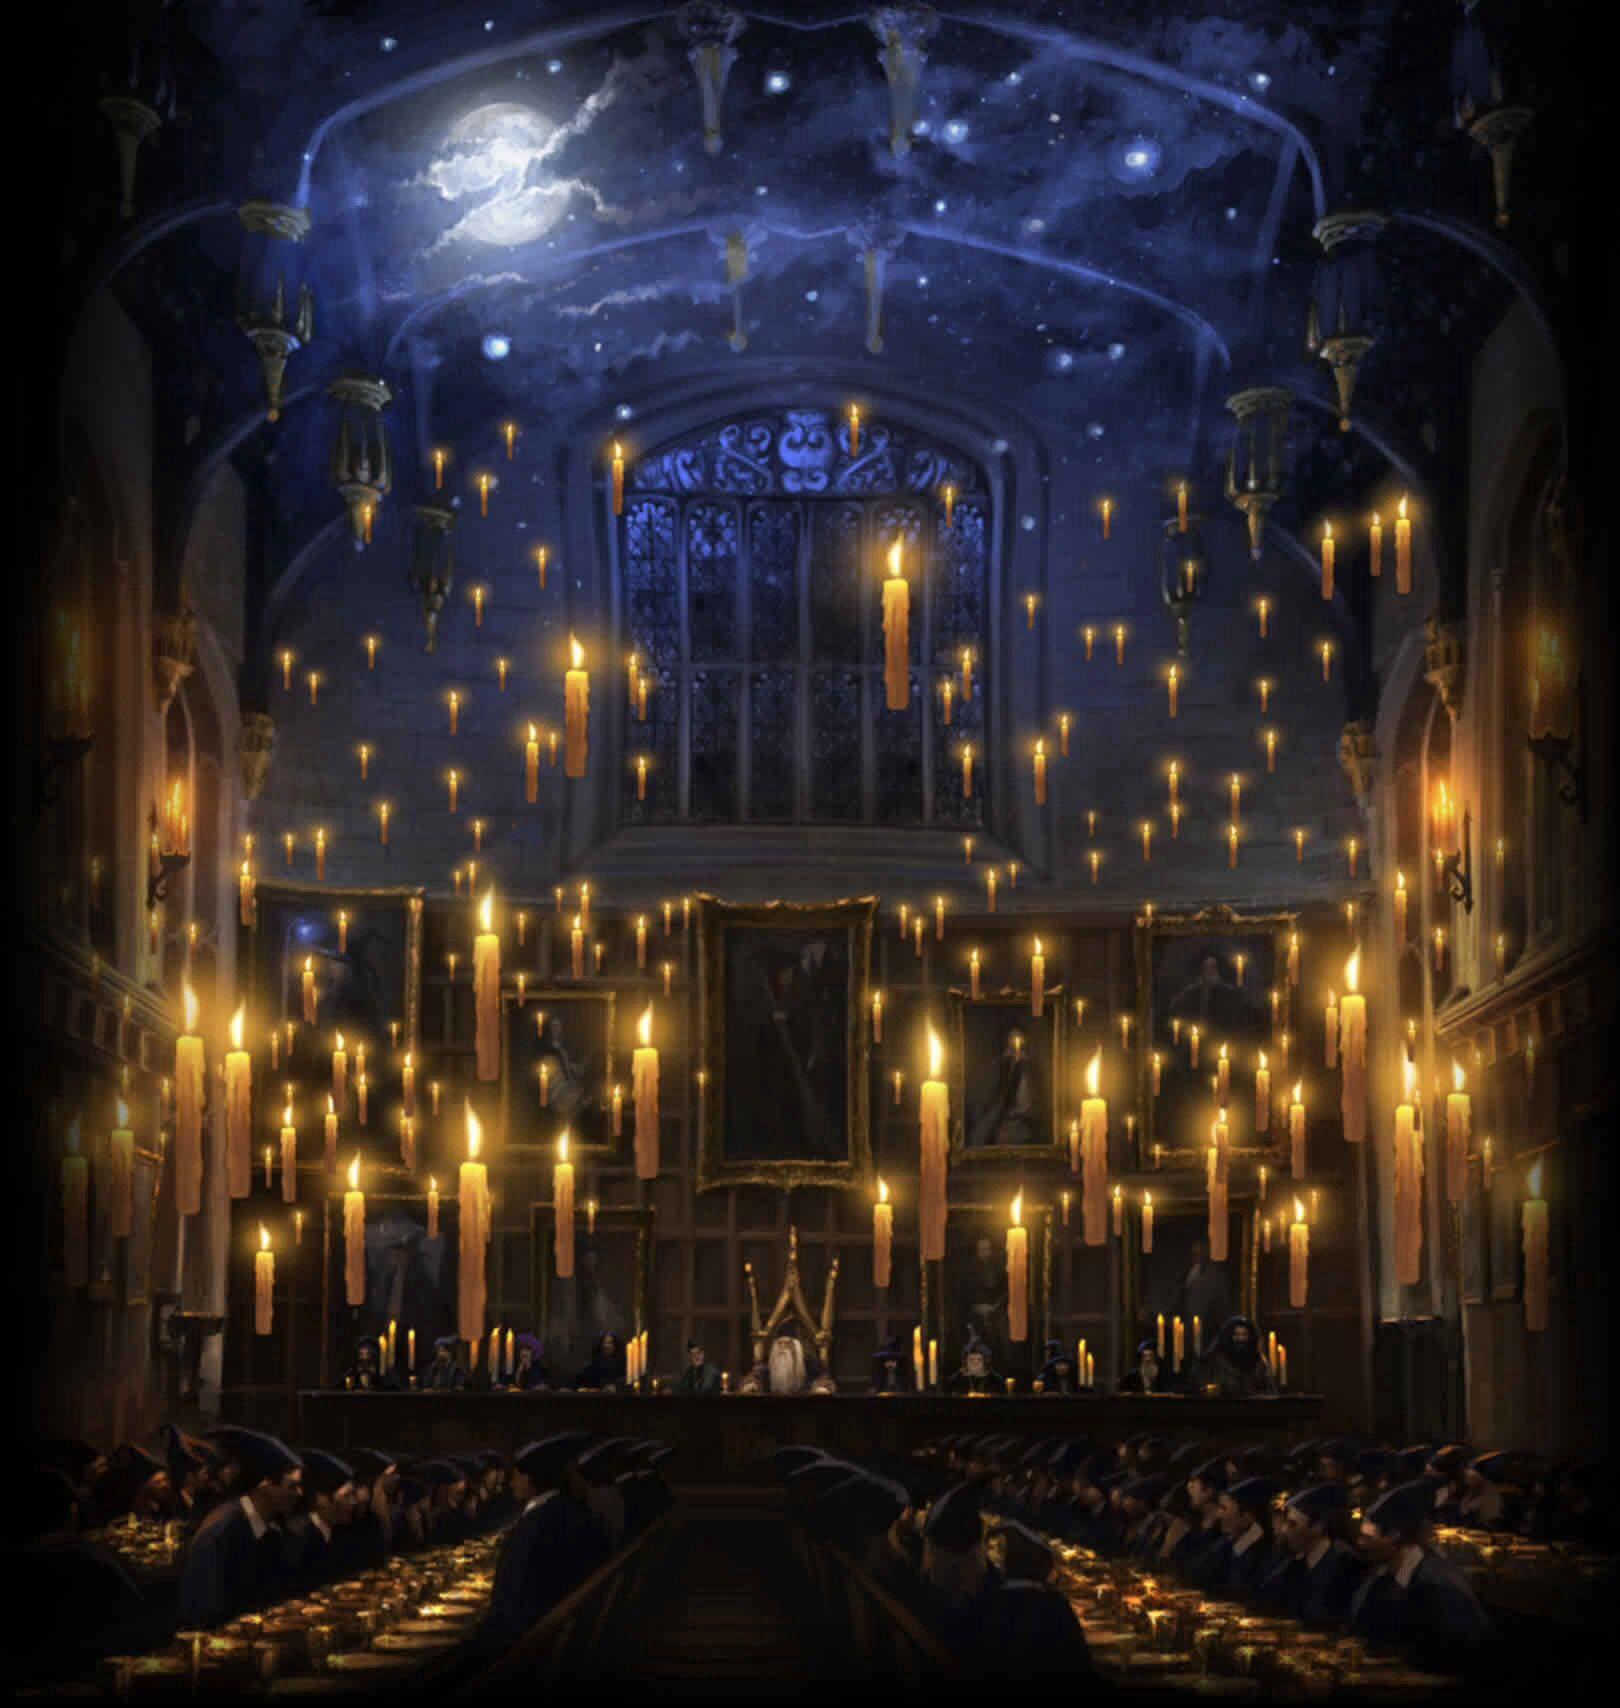 Hogwarts Harry Potter Wiki Harry Potter Wallpaper Hogwarts Great Hall